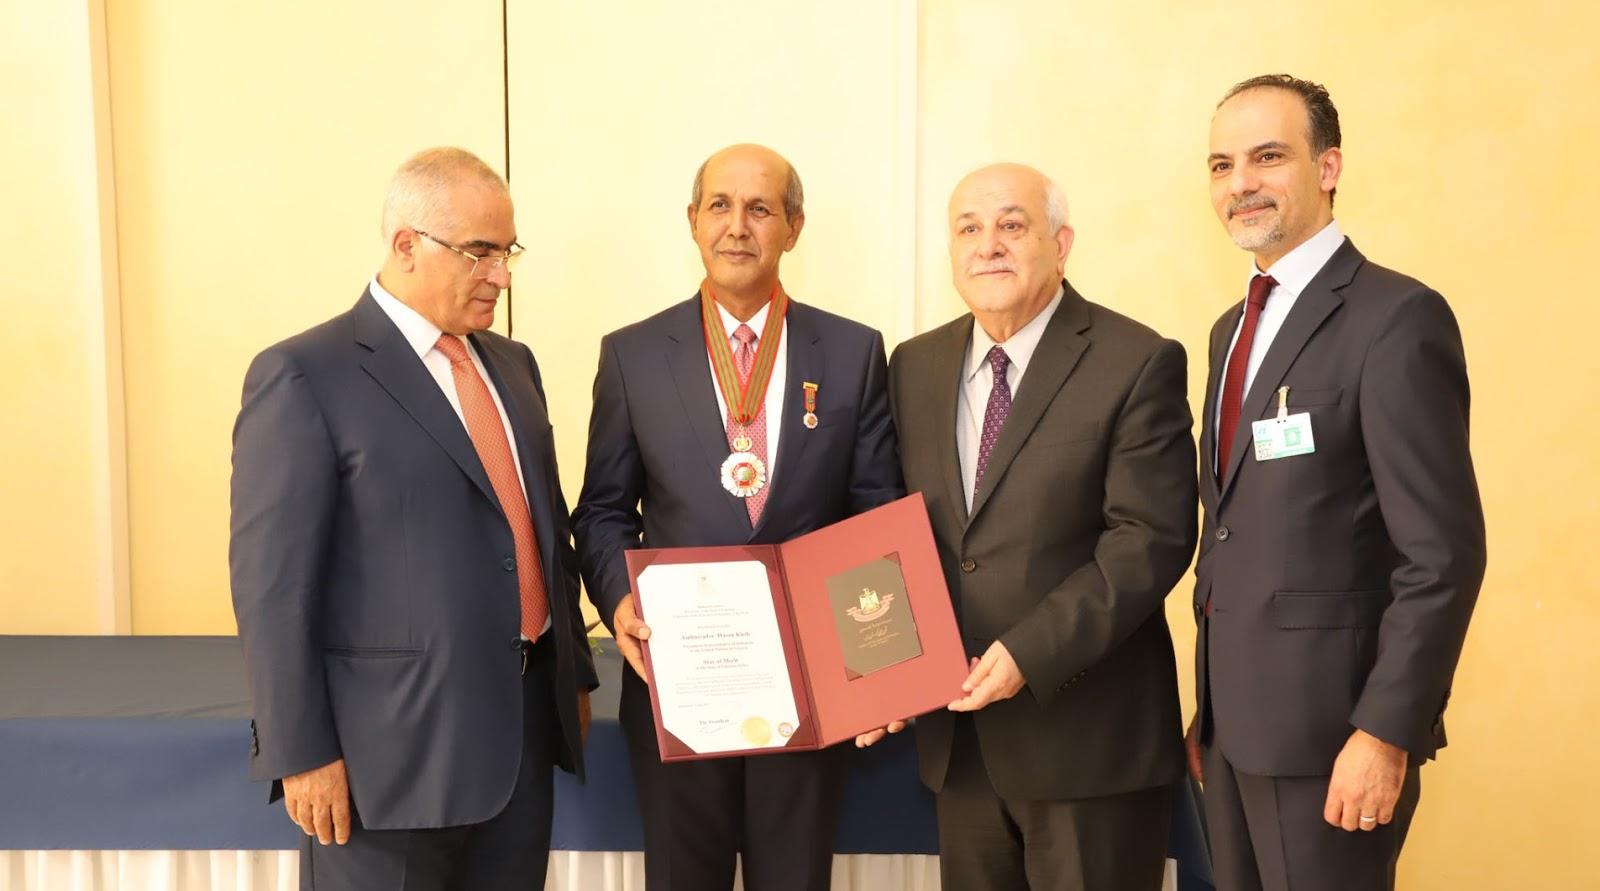 Dubes Hasan Kleib di Anugrahi Tanda Jasa Oleh Presiden Palestina